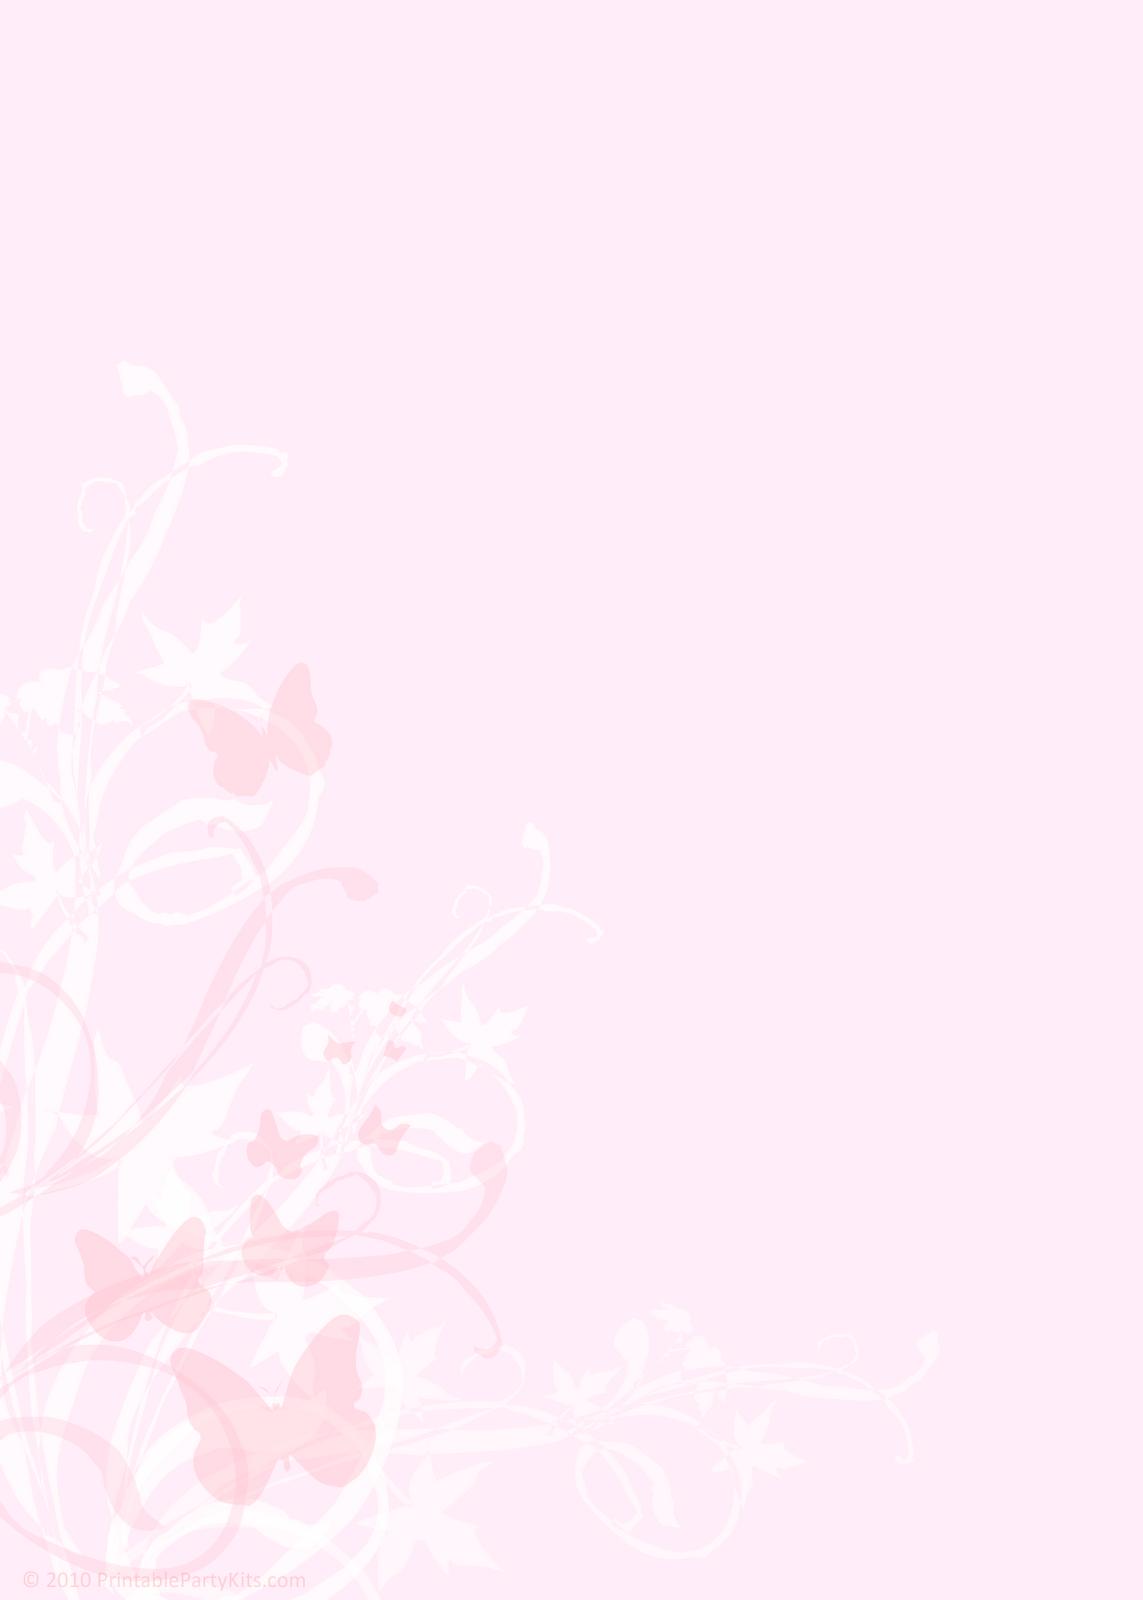 Free Printable Quinceanera Invitation Templates | Diy's | Pinterest - Free Printable Quinceanera Invitations